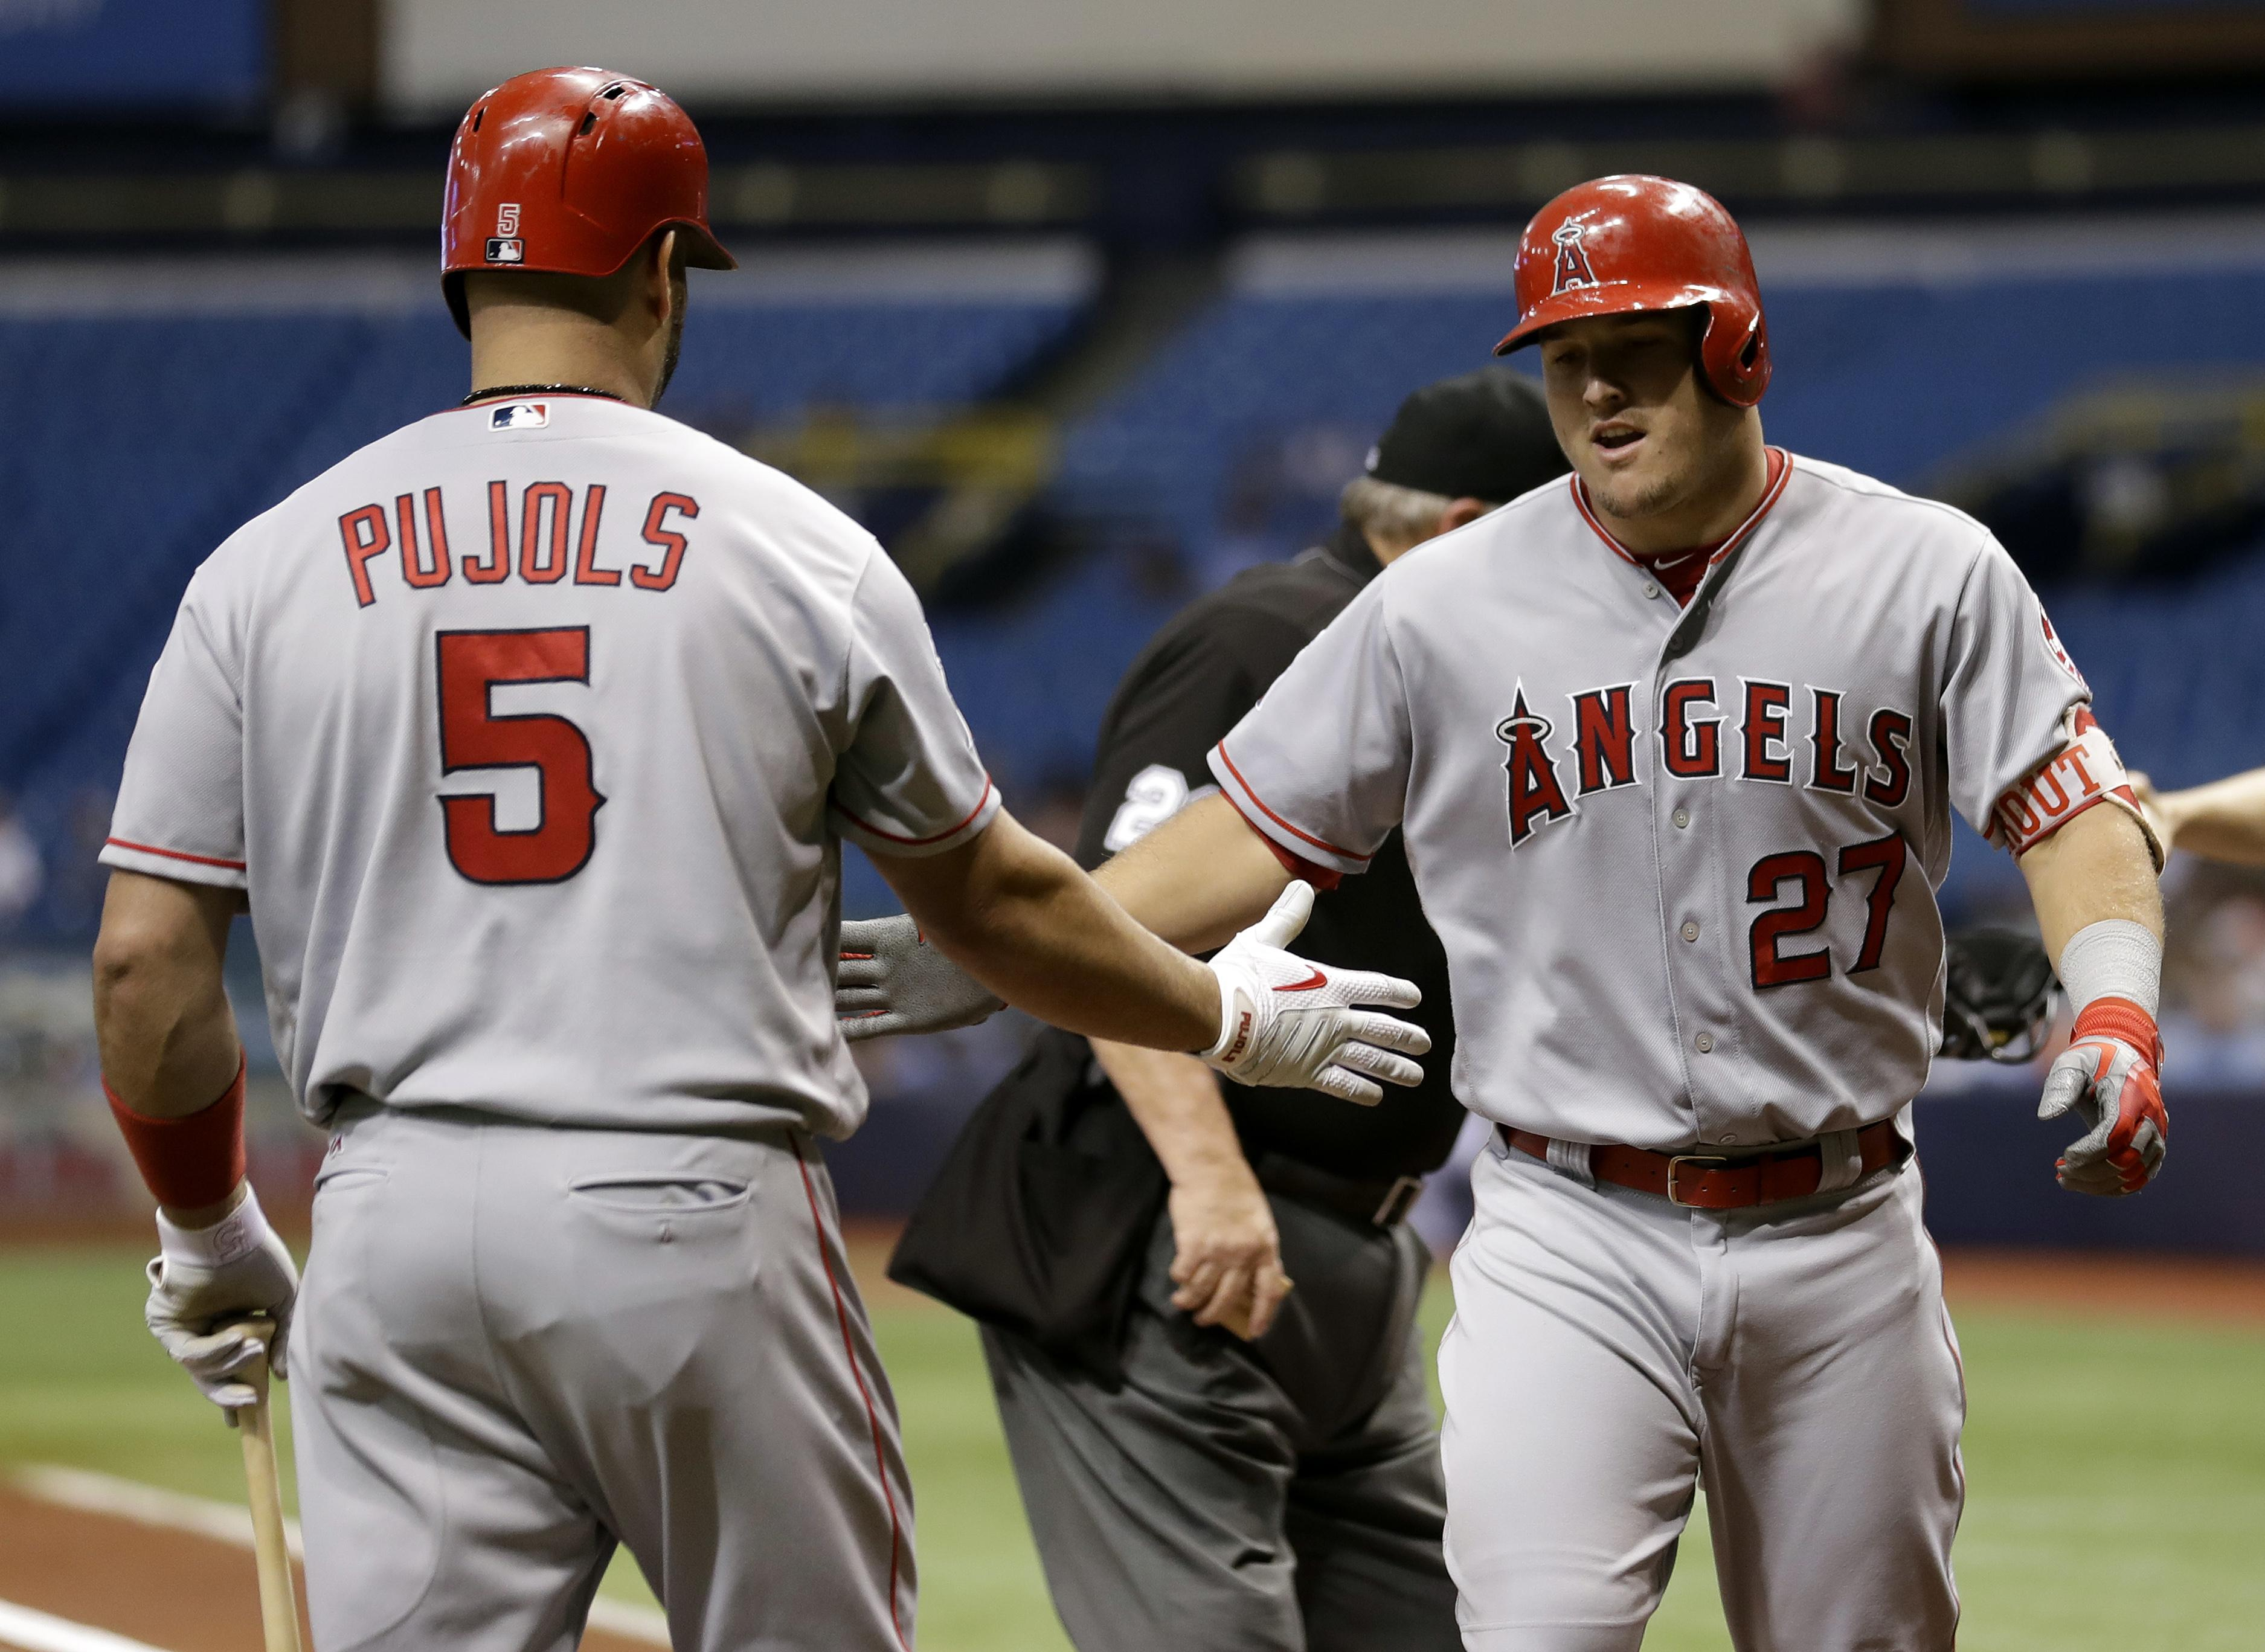 Angels_rays_baseball_54280